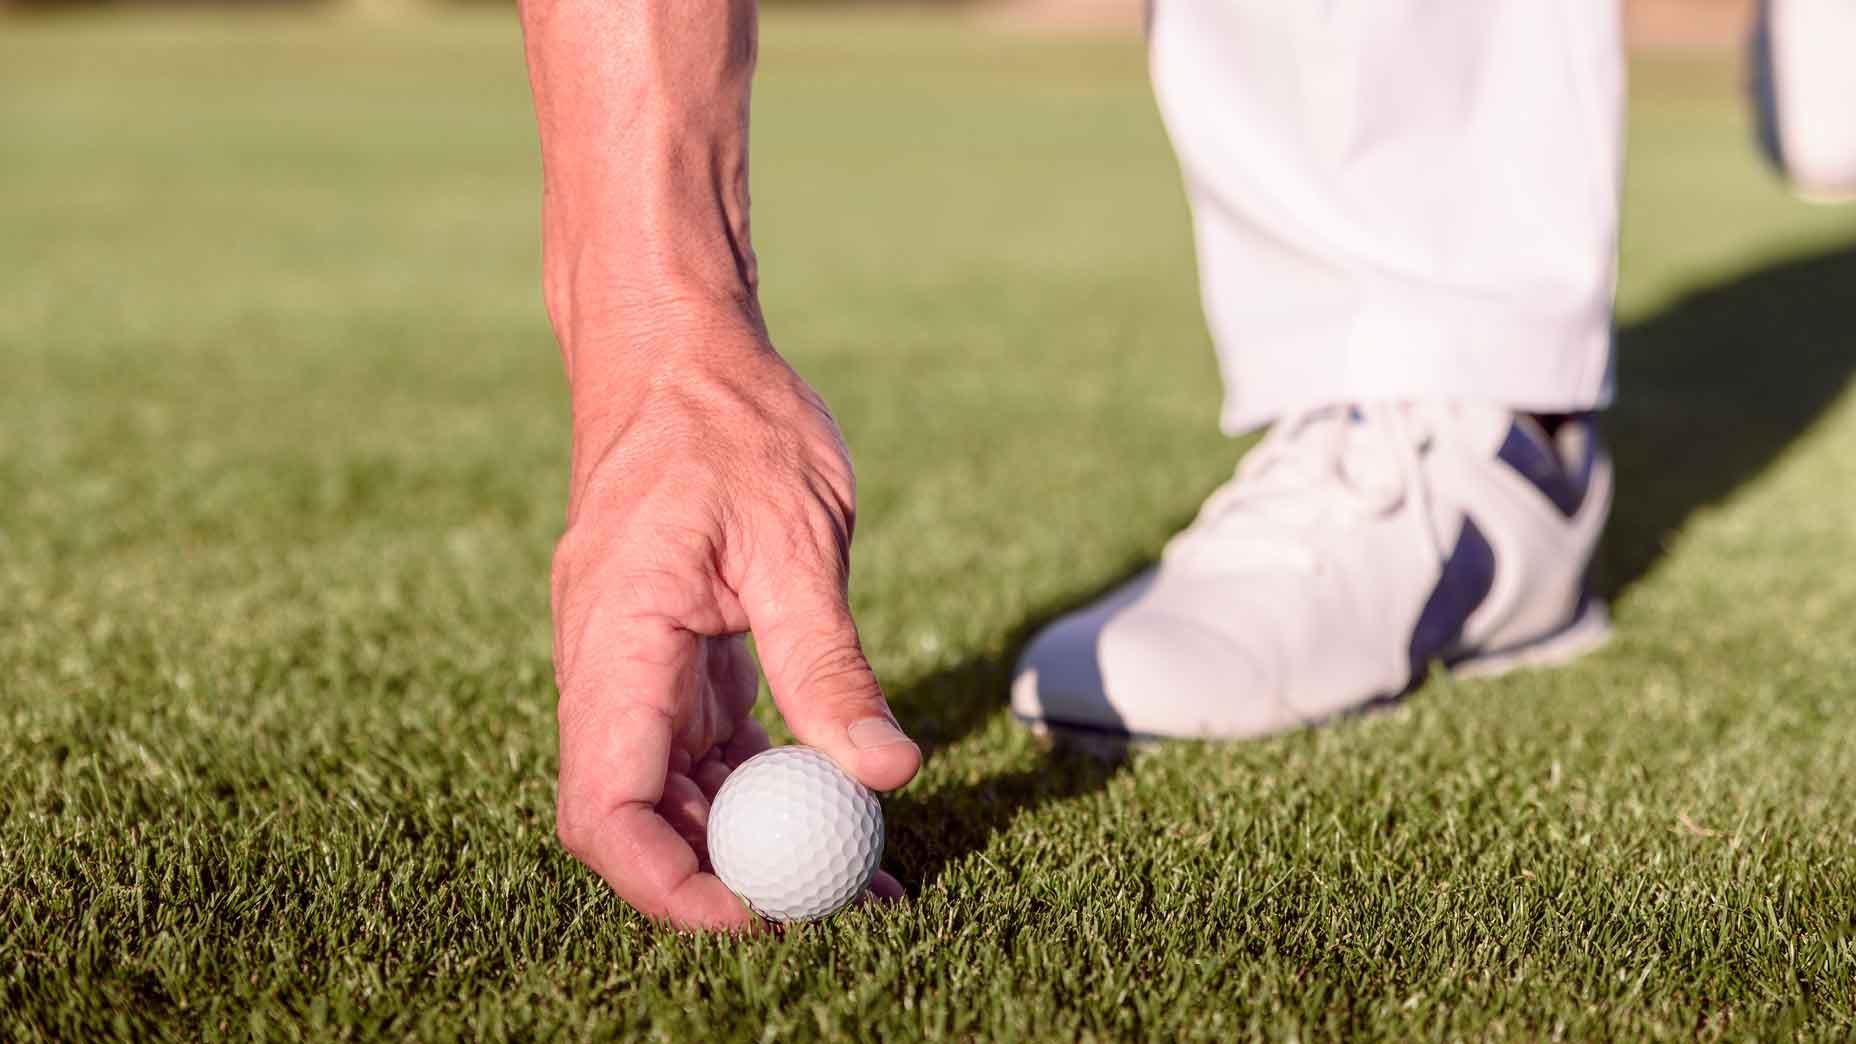 Golfer placing ball